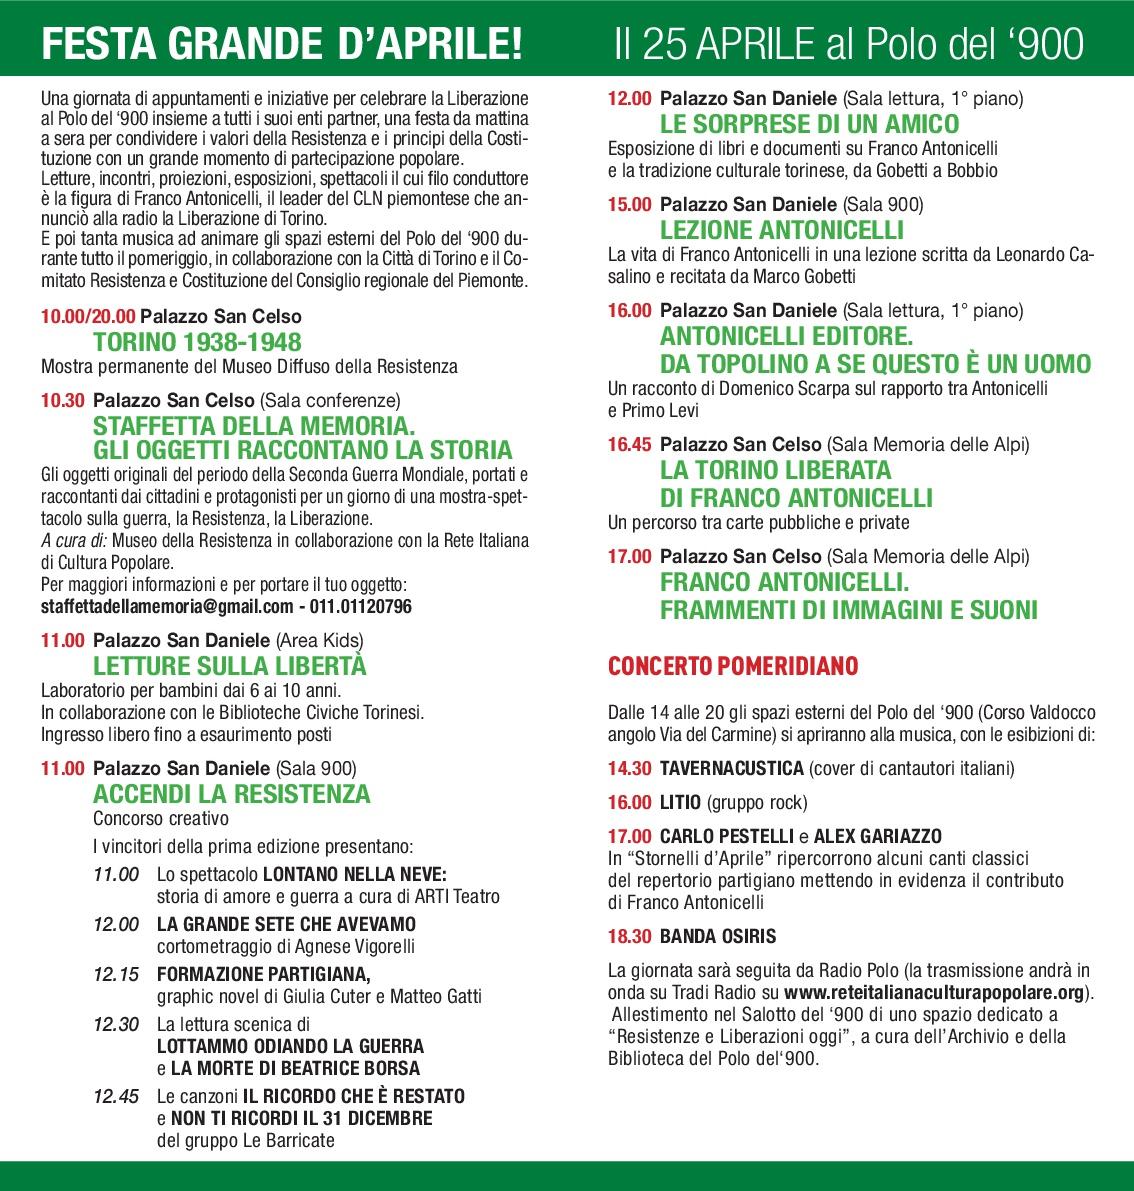 POLO-900---25-aprile---Programma---V3-(1)-005